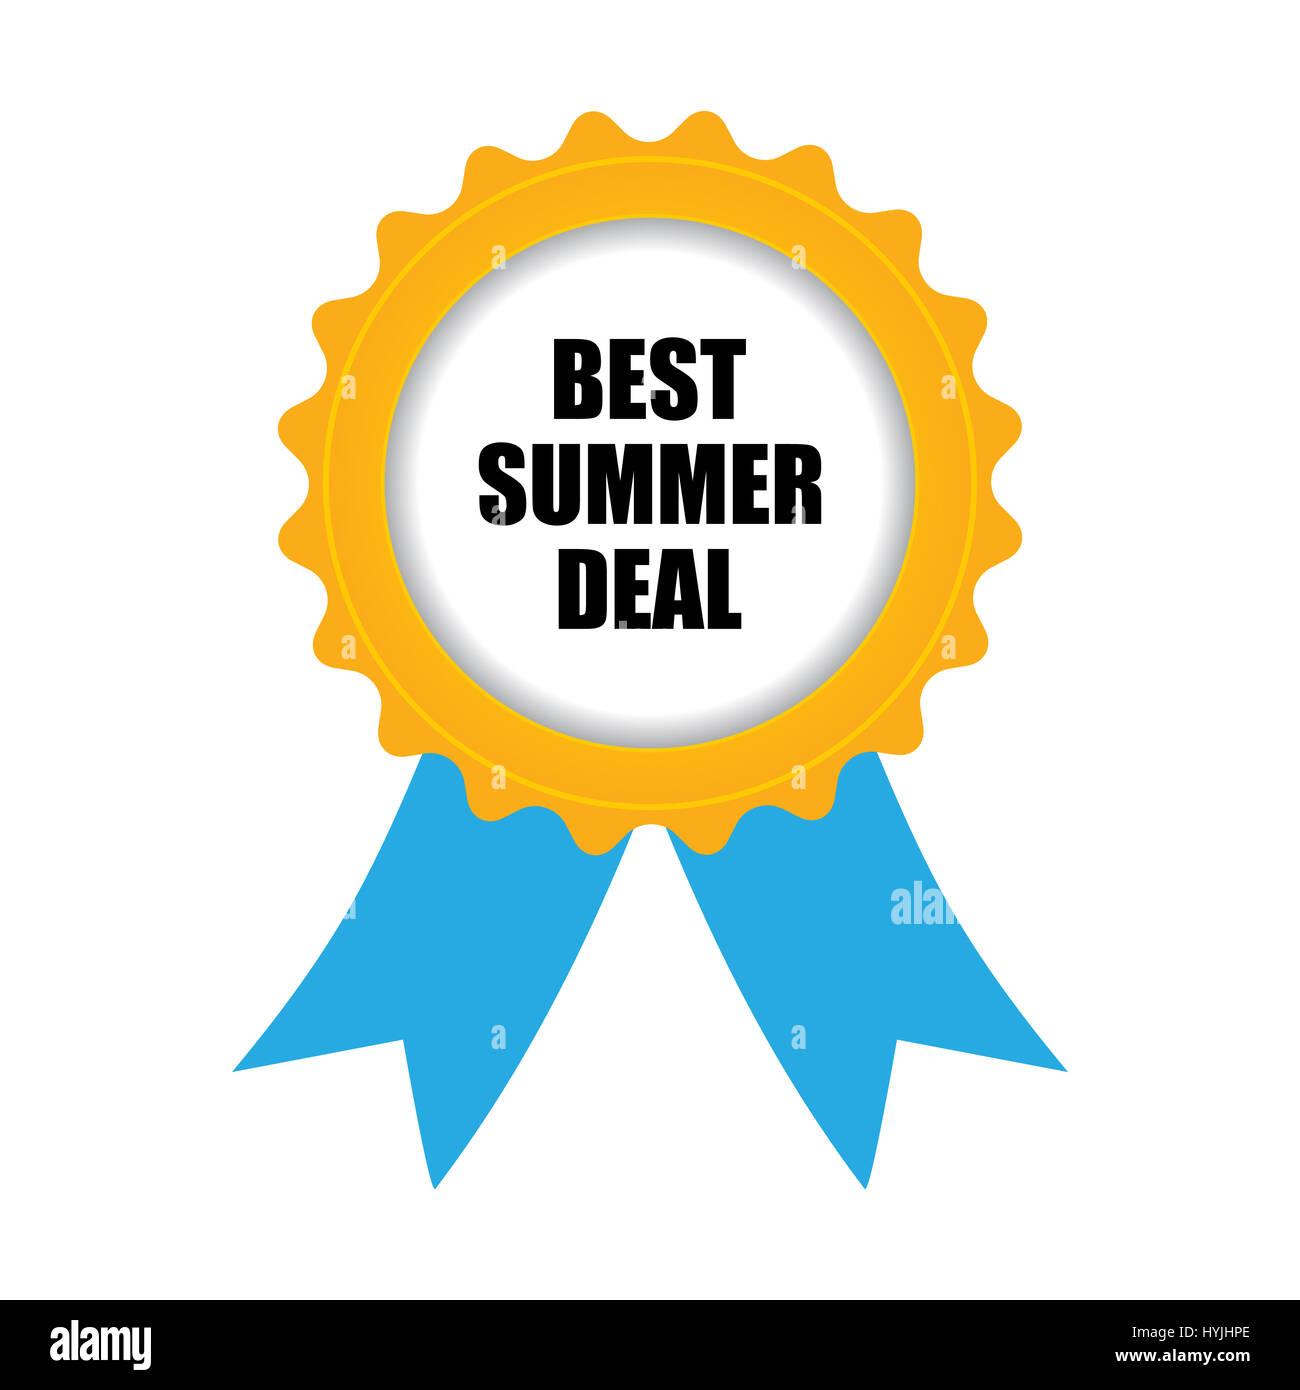 best summer deal badge, blue-yellow design - Stock Image